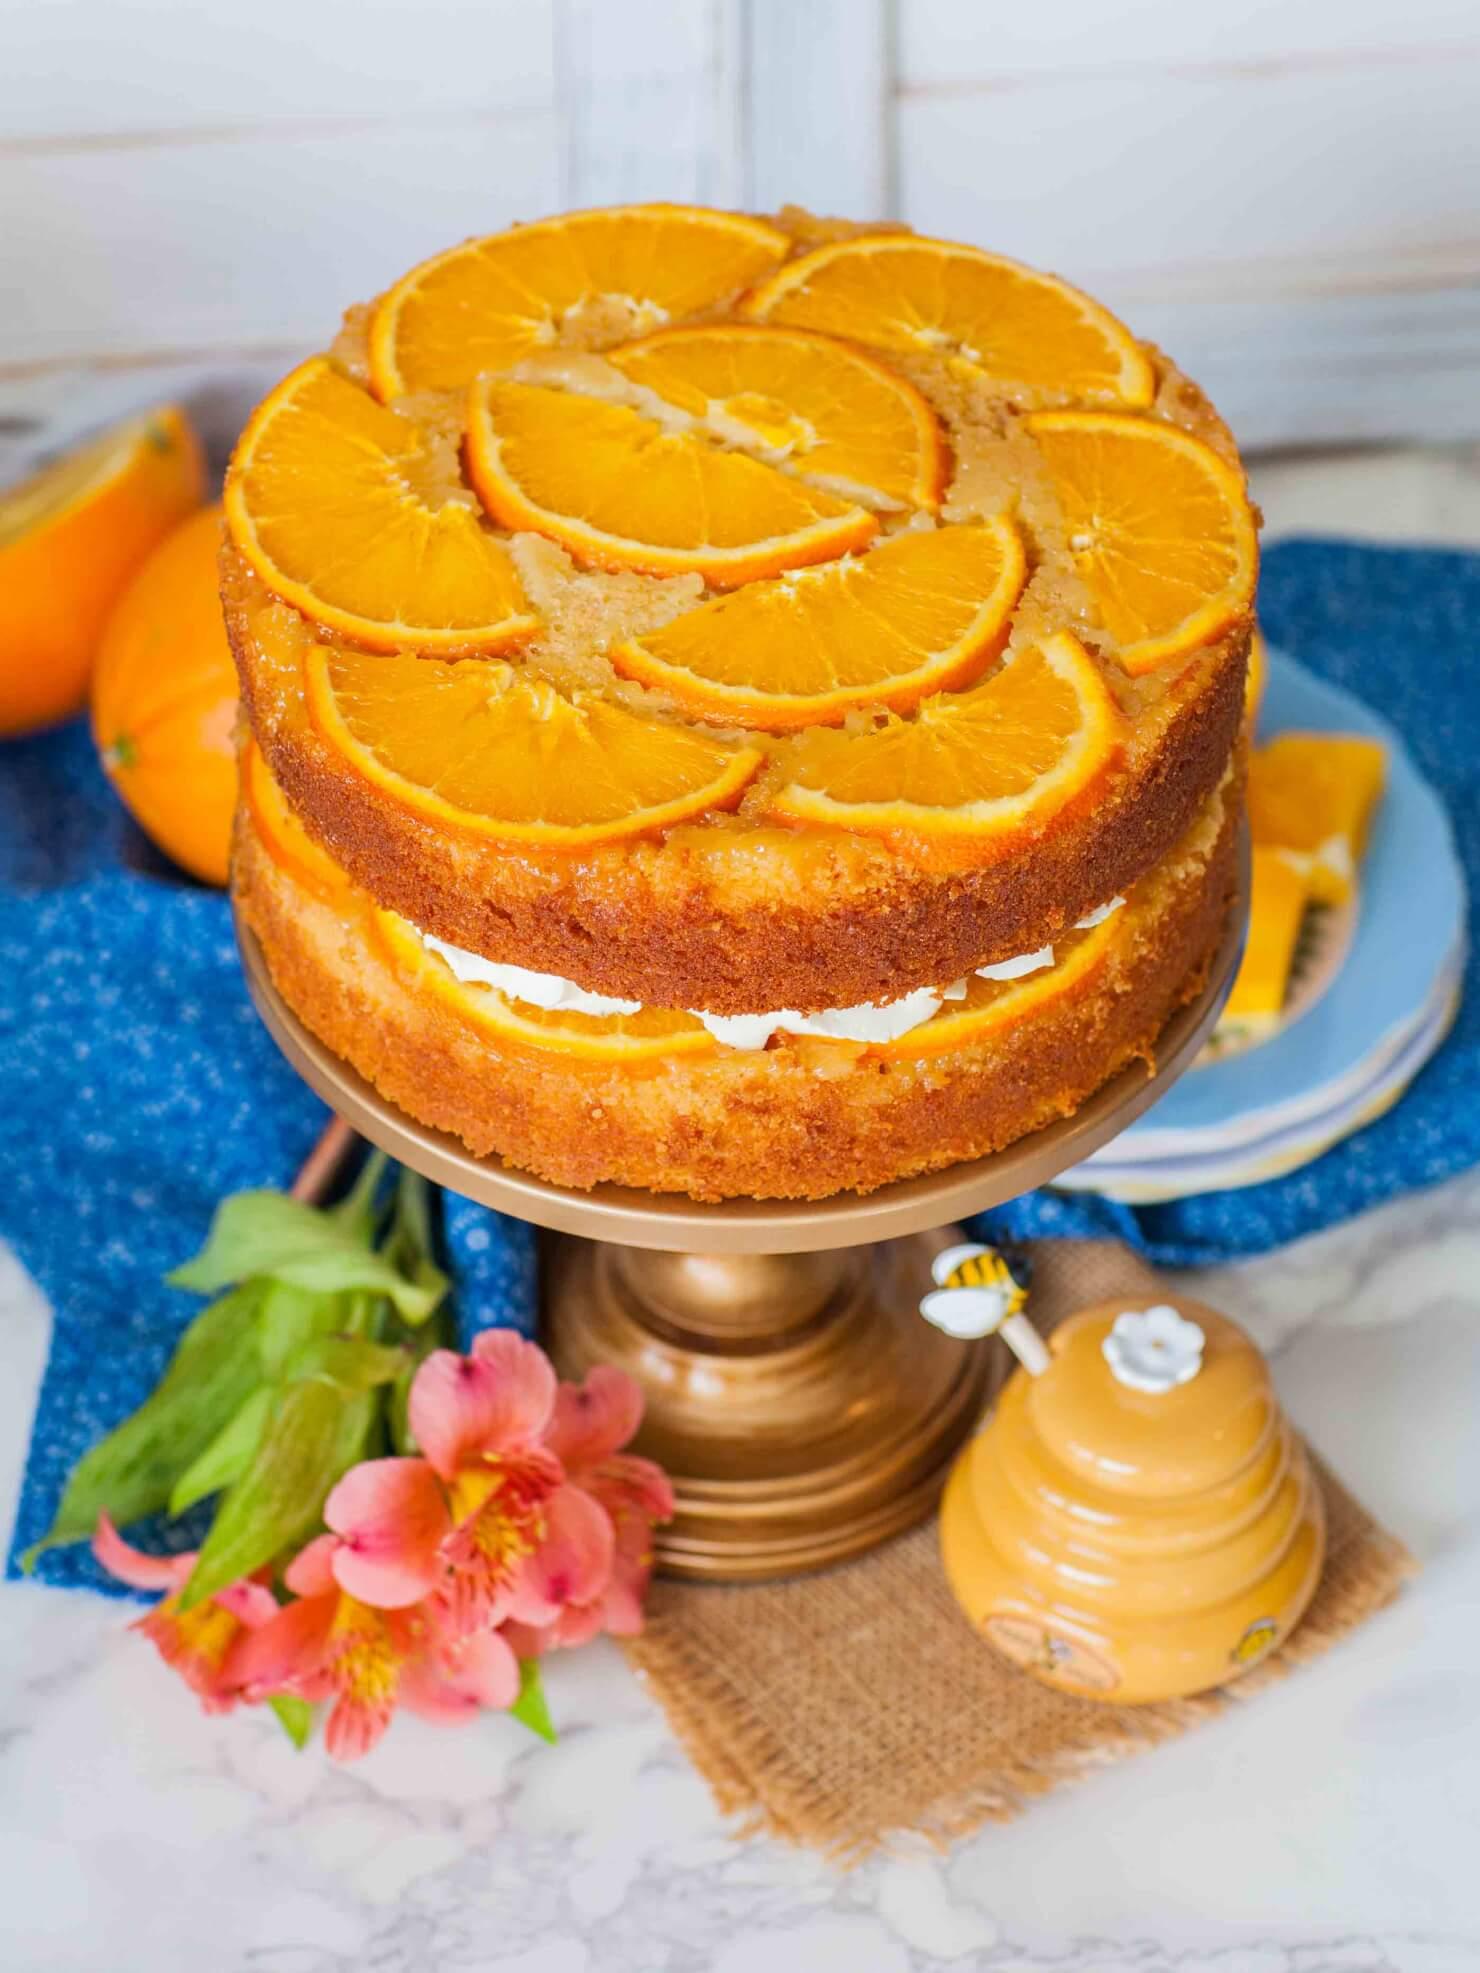 upside down cake with orange slices